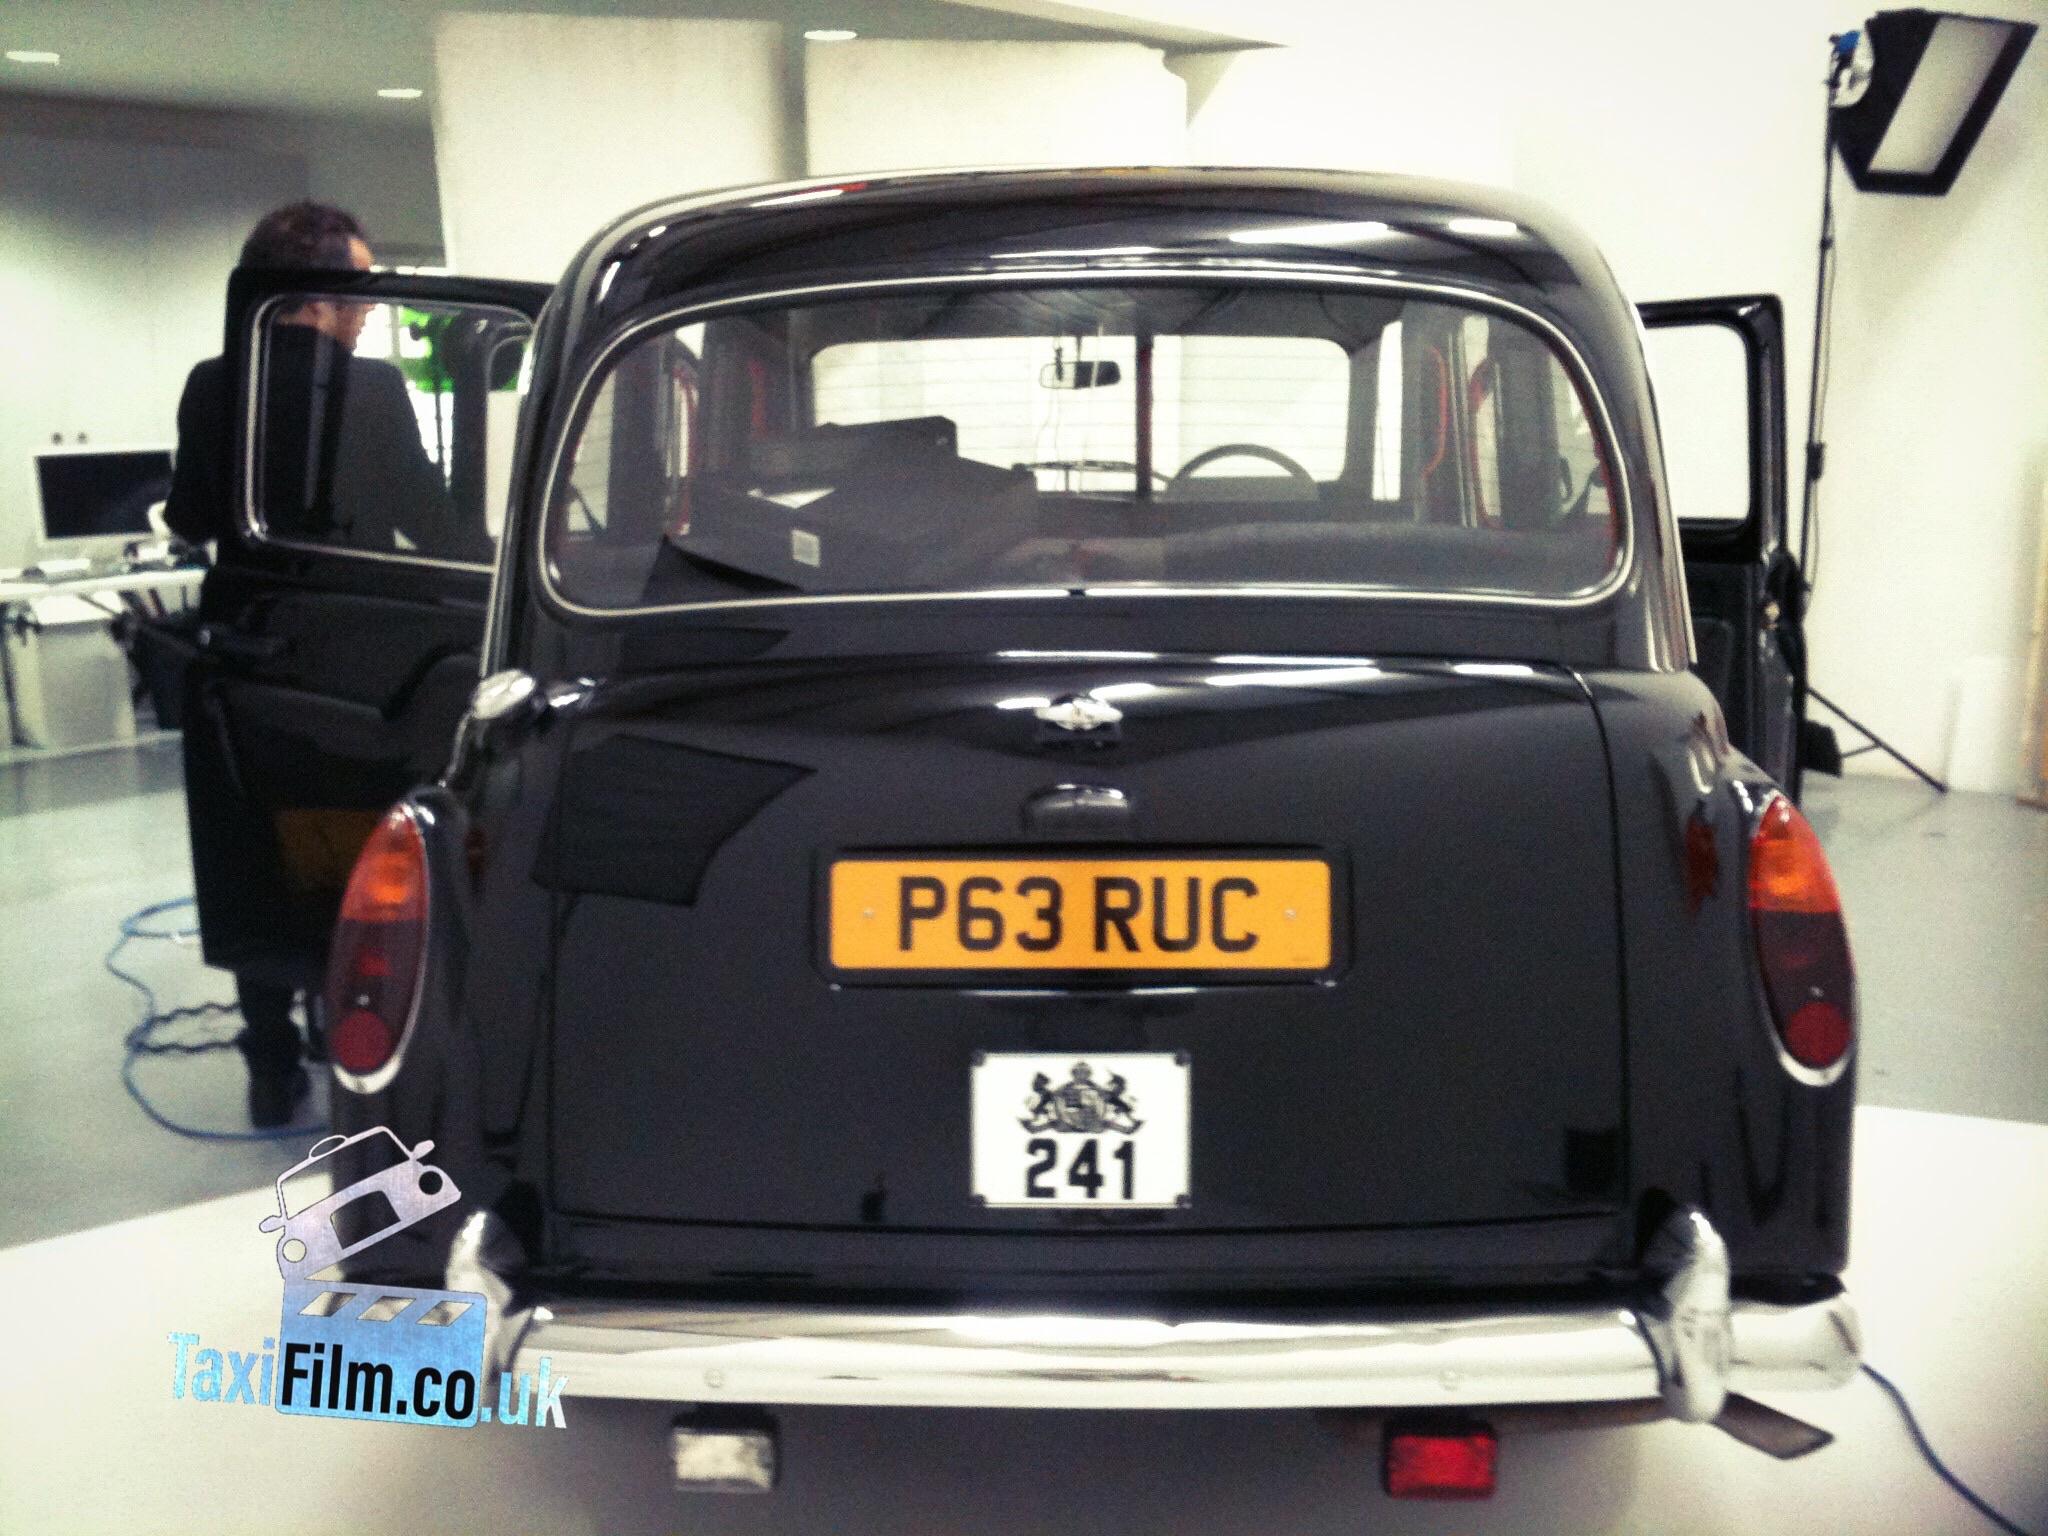 Black Fairway Taxi  1996, London ref F0104